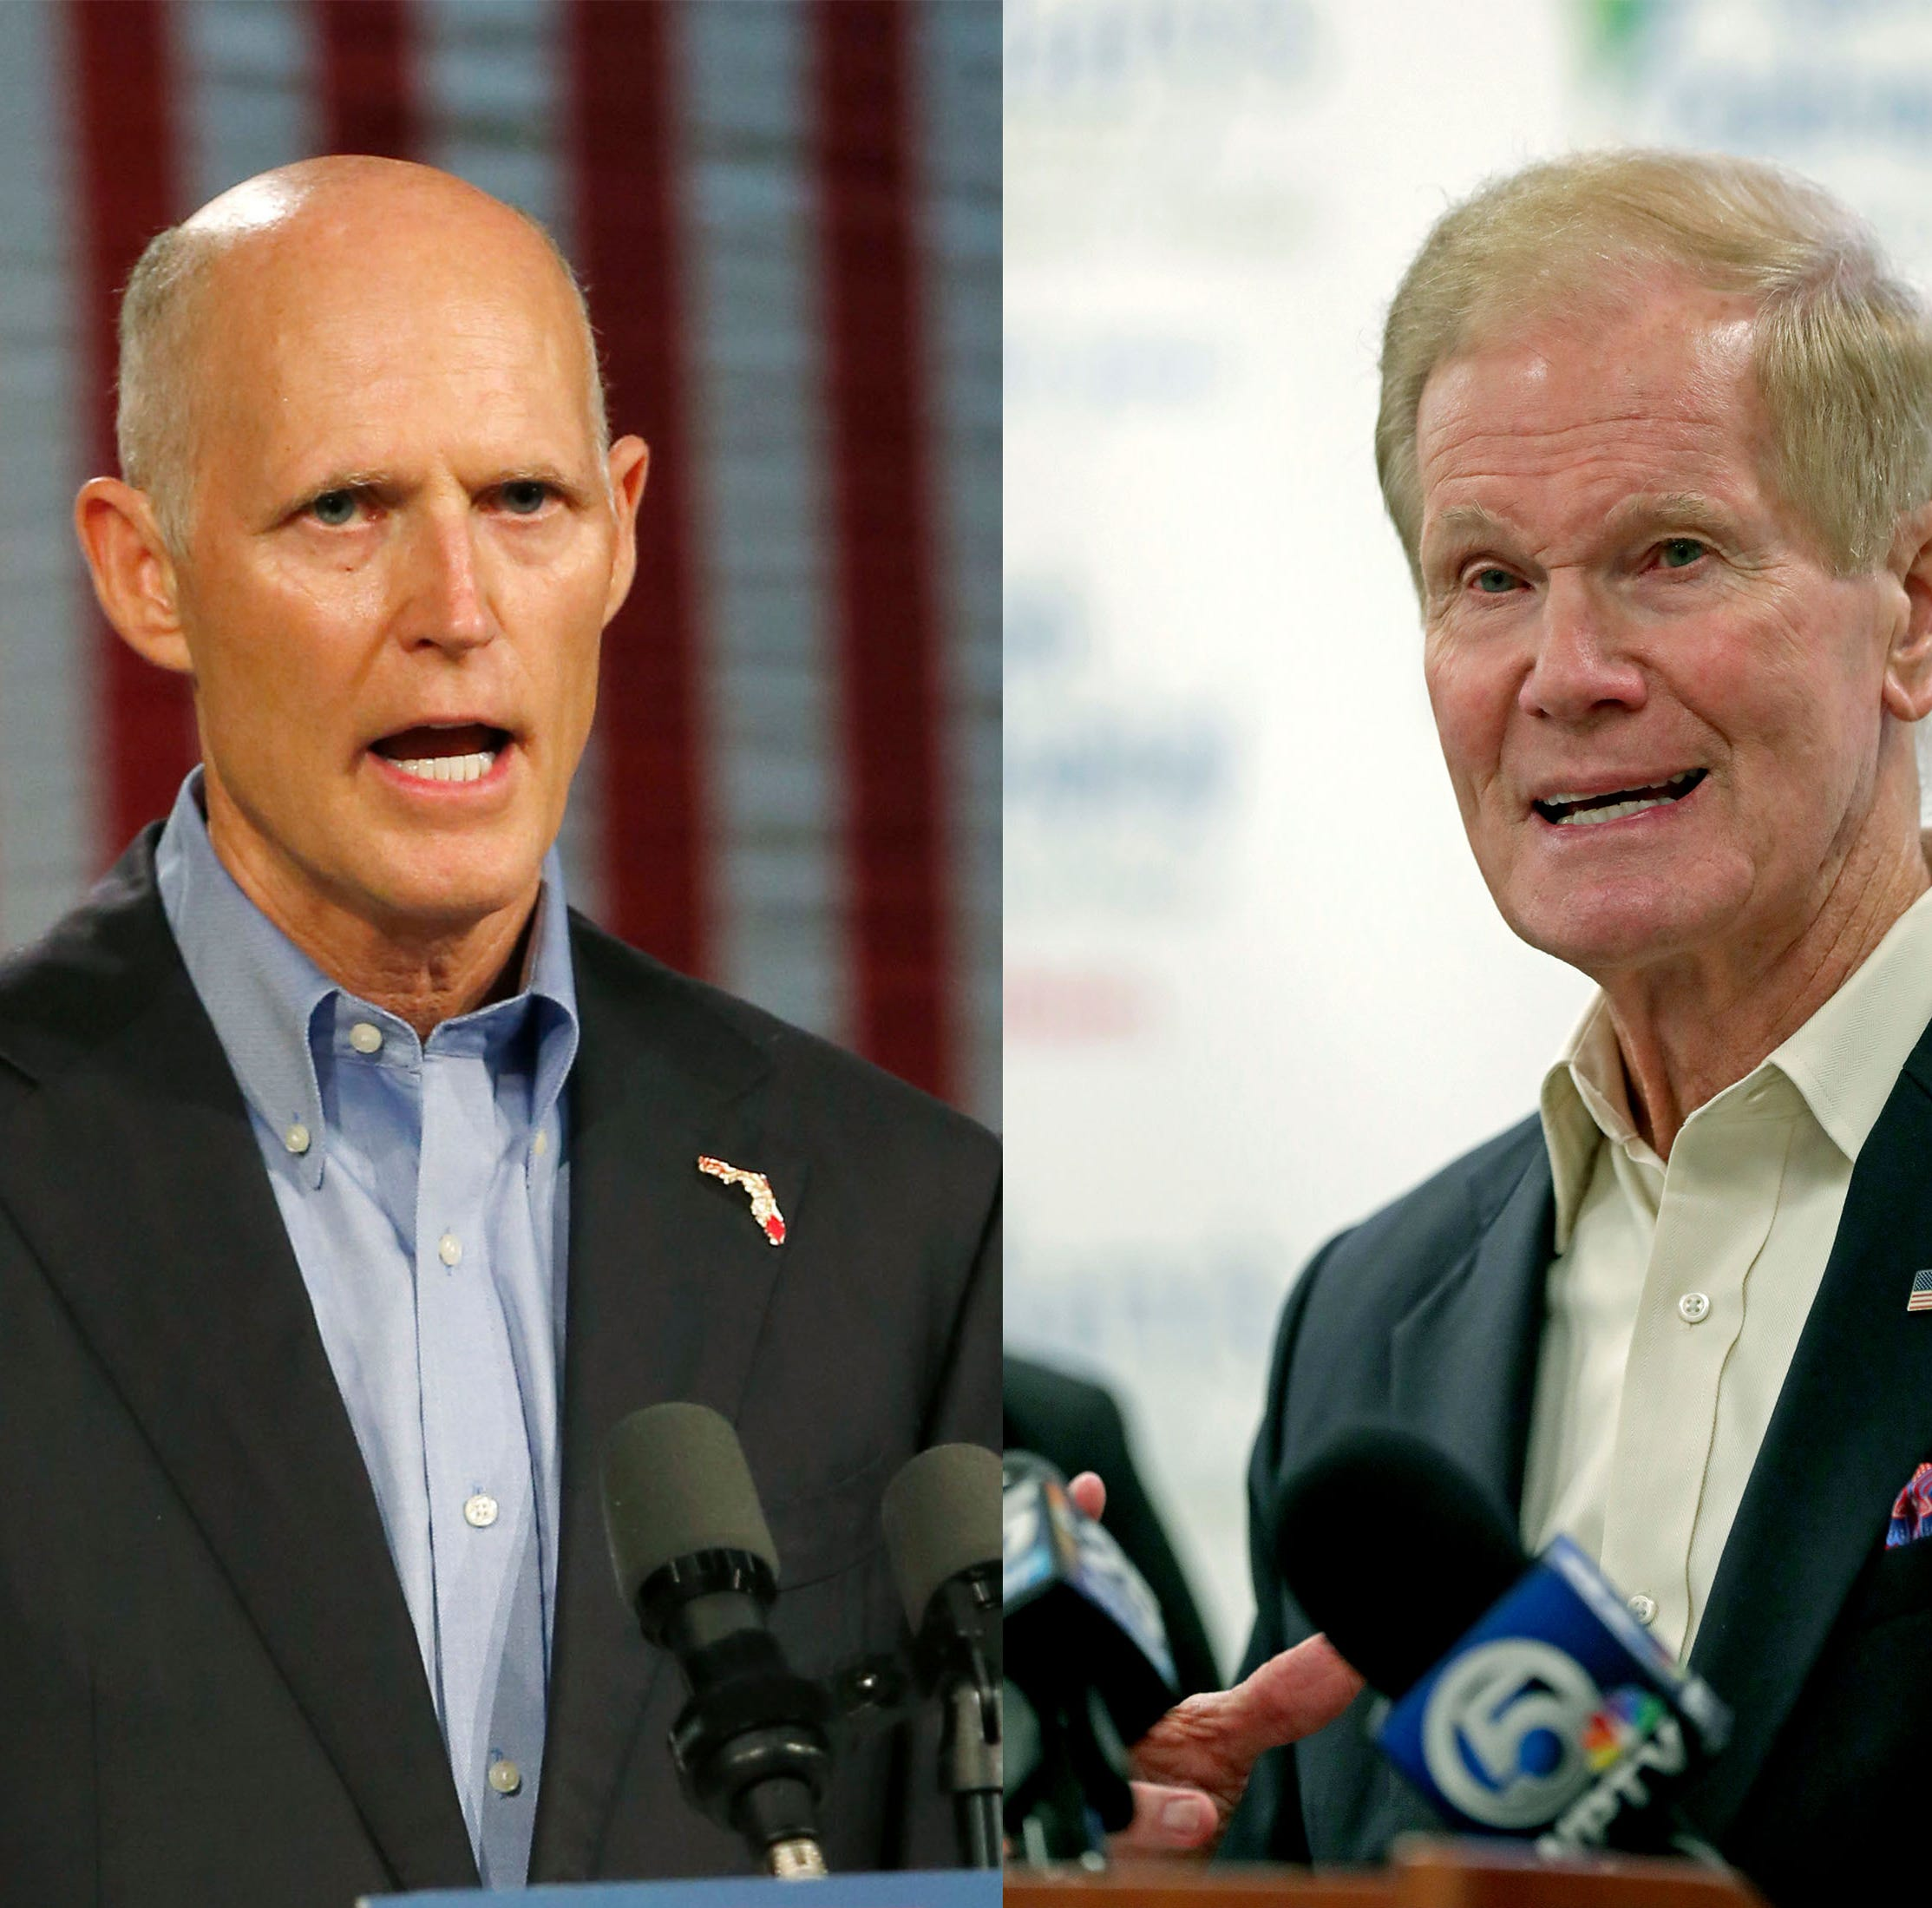 Florida Republican Gov. Rick Scott, left, is hoping to unseat Sen. Bill Nelson, D-Fla. in November